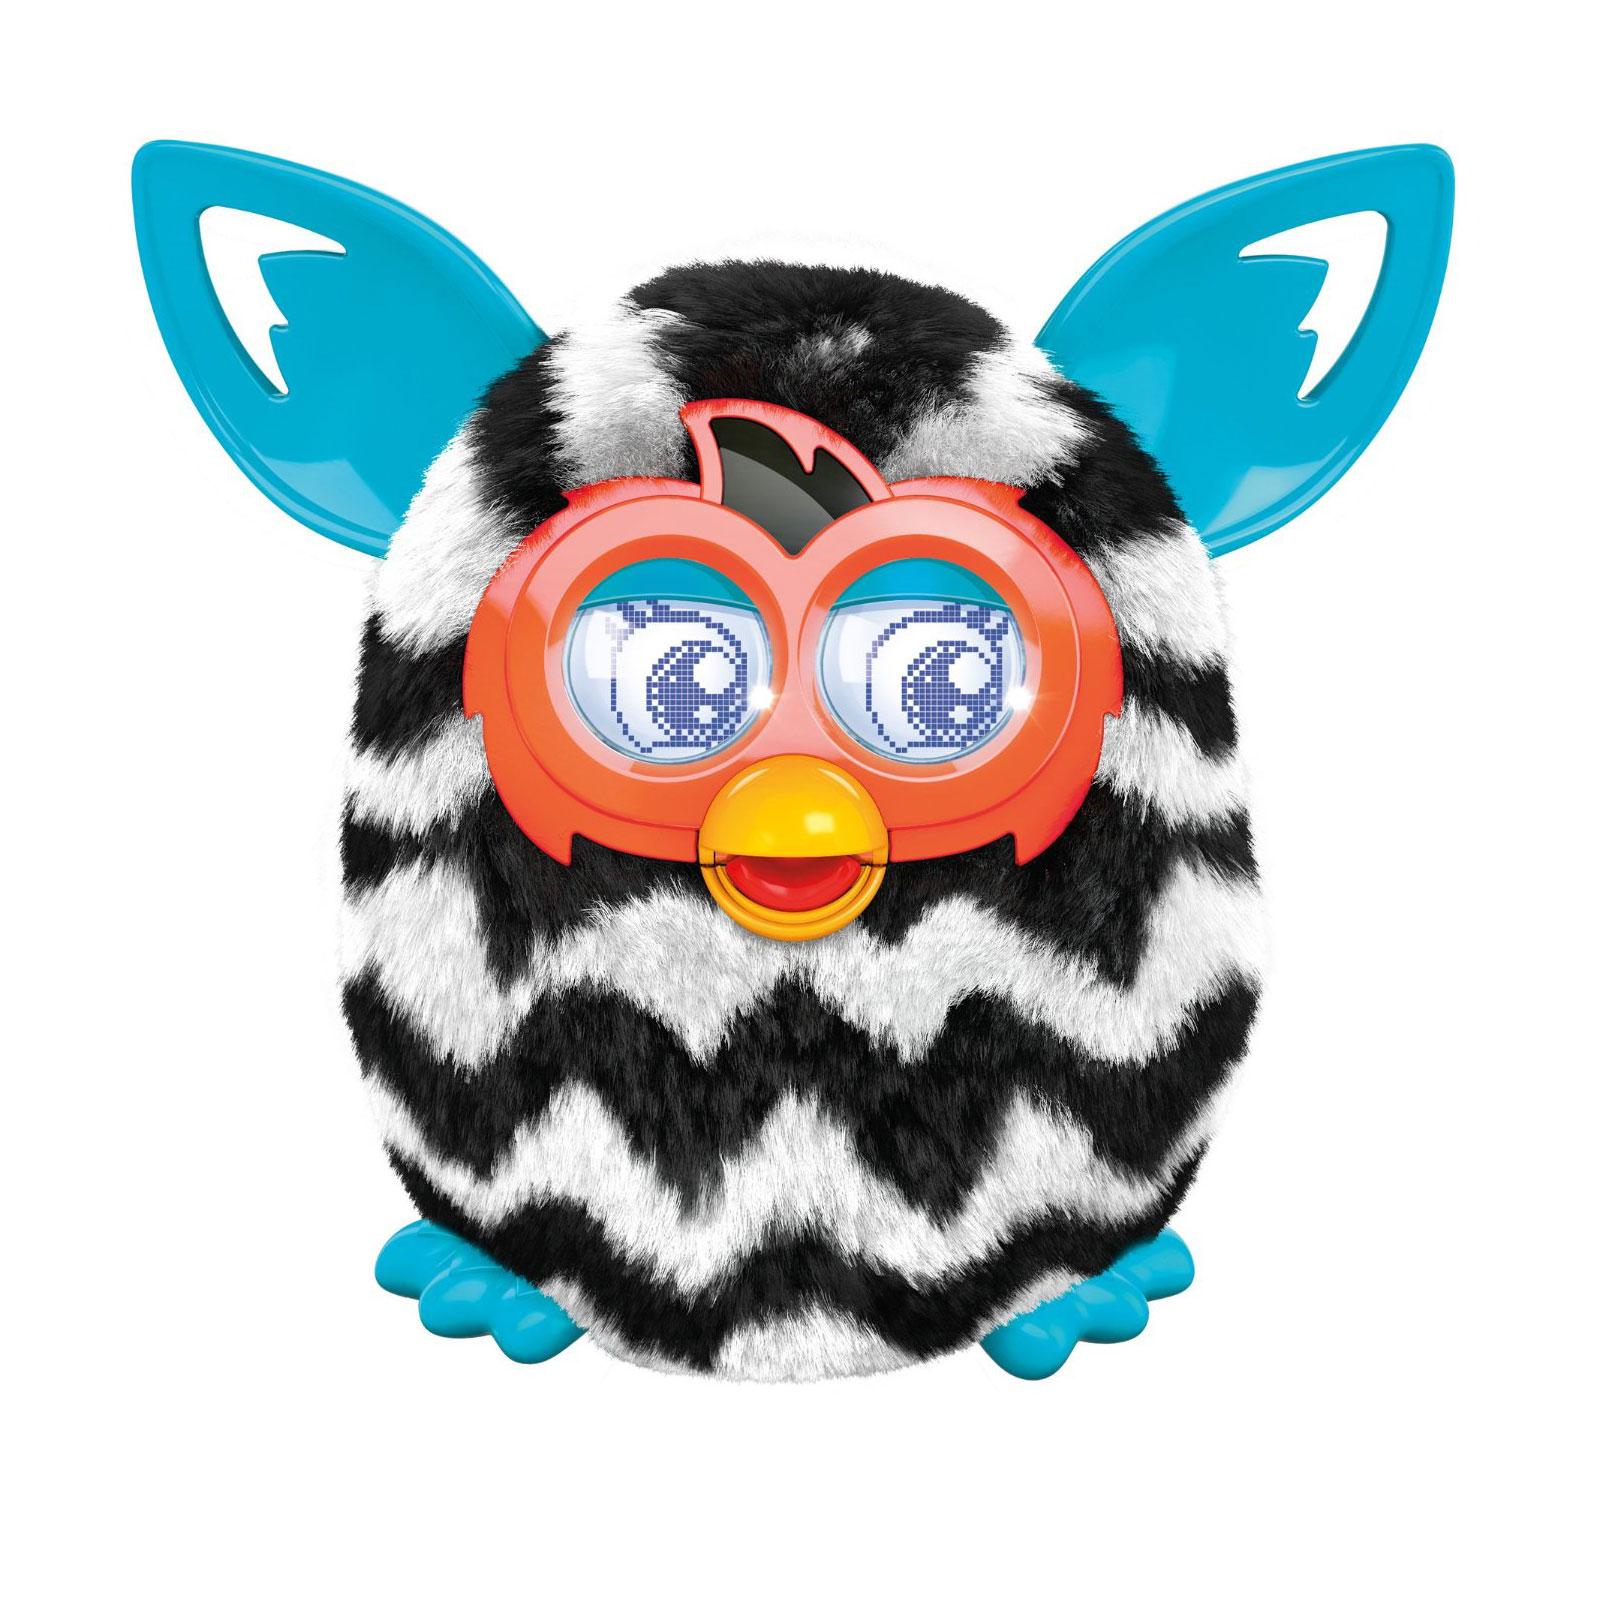 ������������� ������� Furby Boom ������ ����� �����-����� � �������